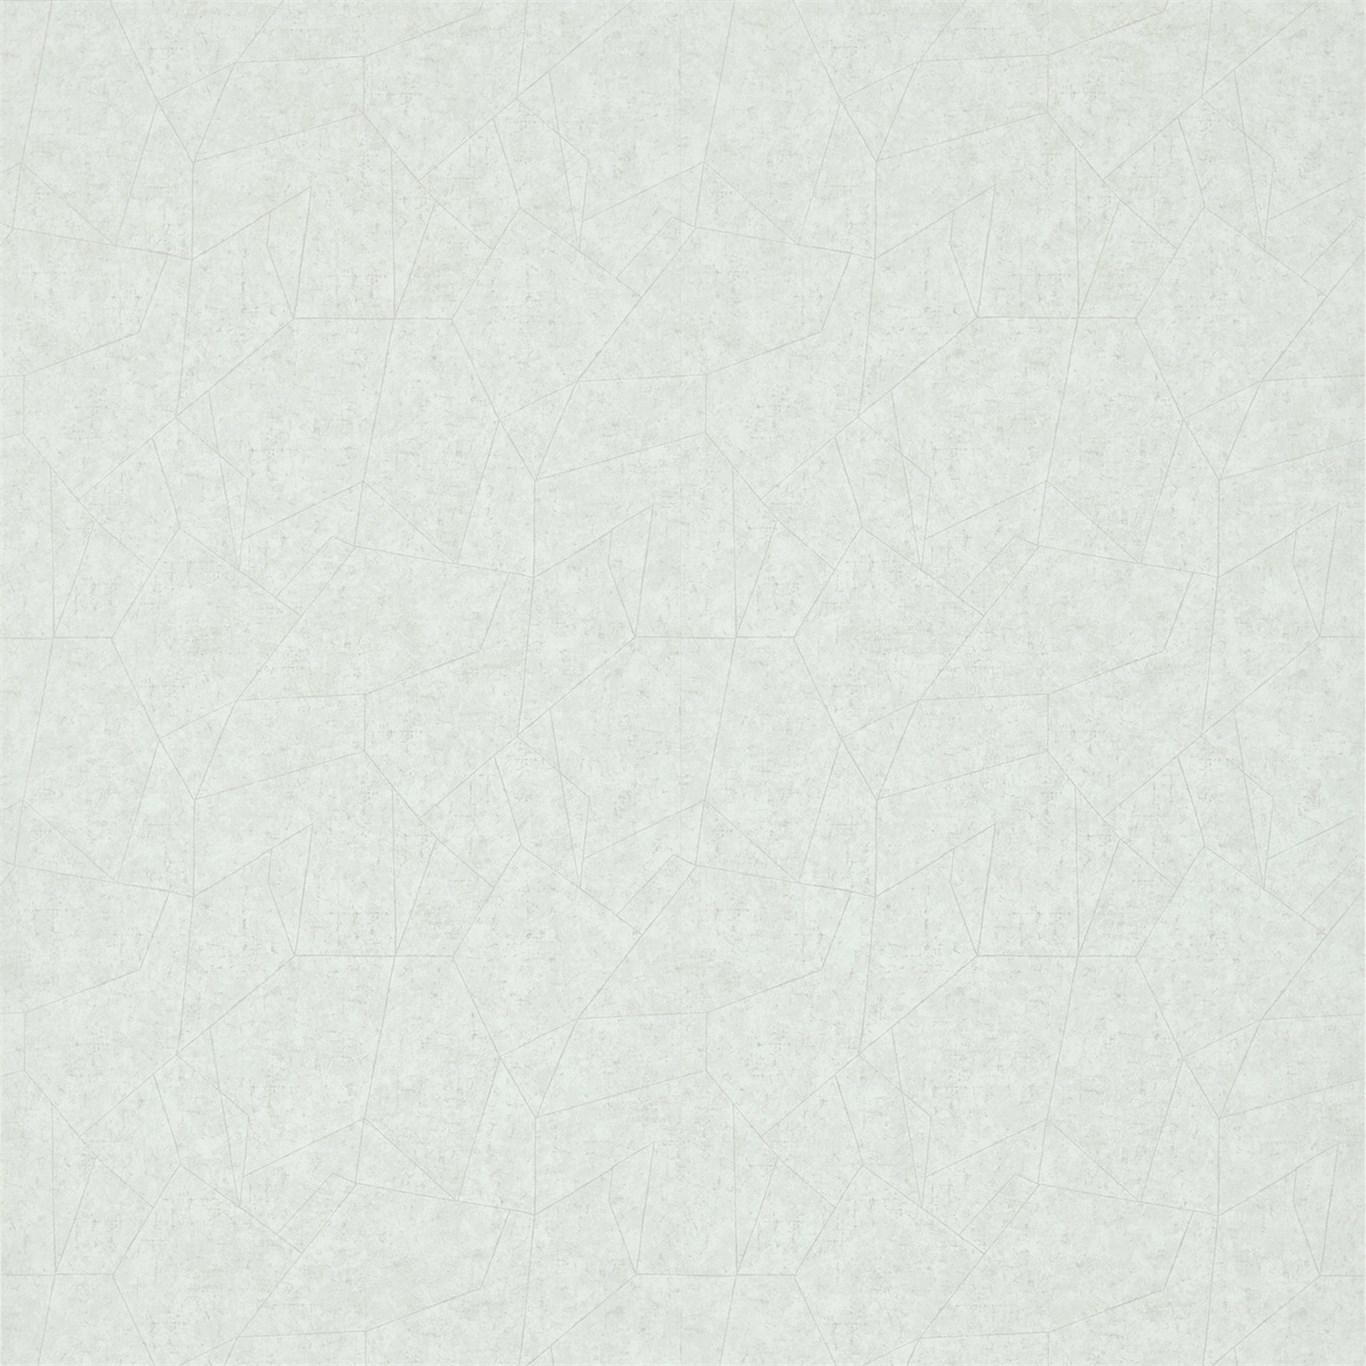 Английские обои Zoffany,  коллекция Prism Vinyls, артикул311791